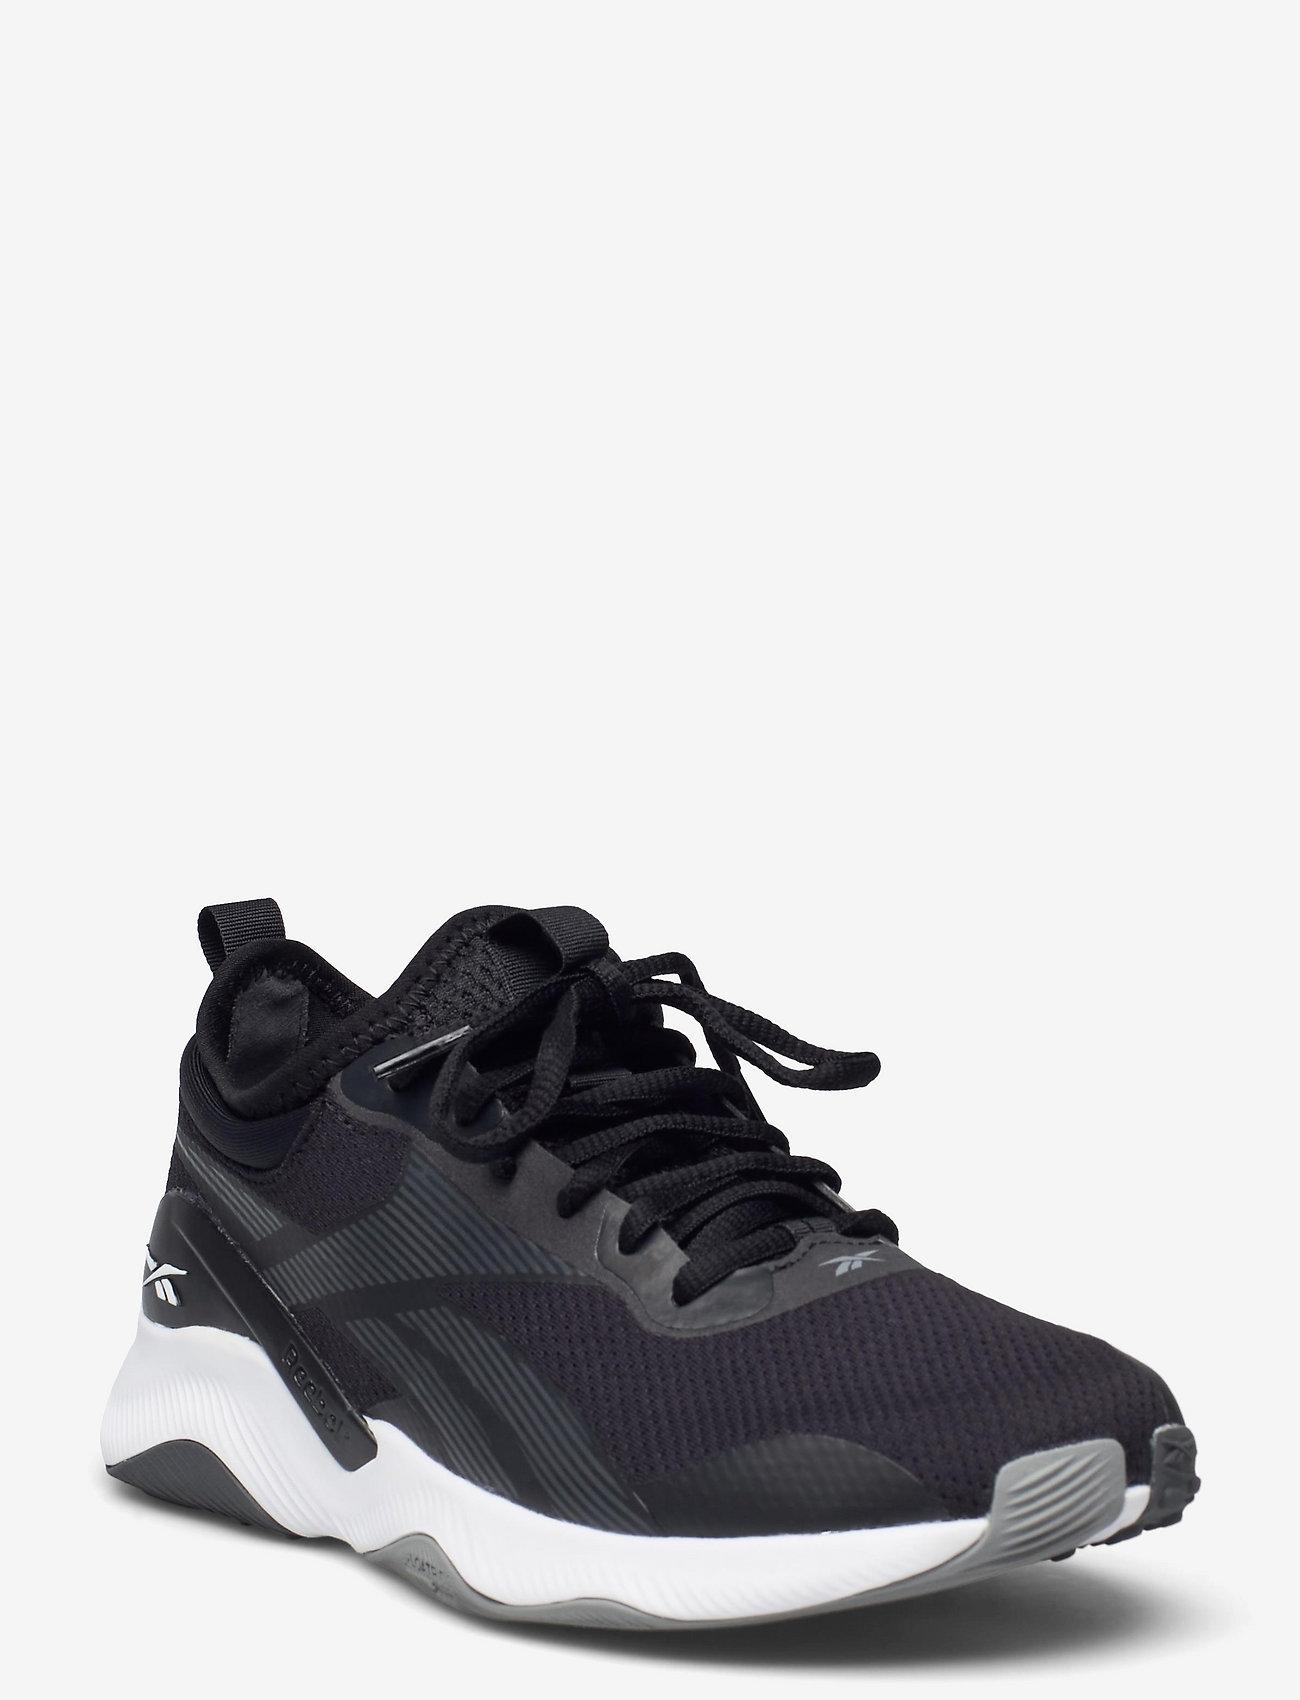 Reebok Performance - REEBOK HIIT TR 2.0 - training schoenen - black/ftwwht/pugry5 - 0